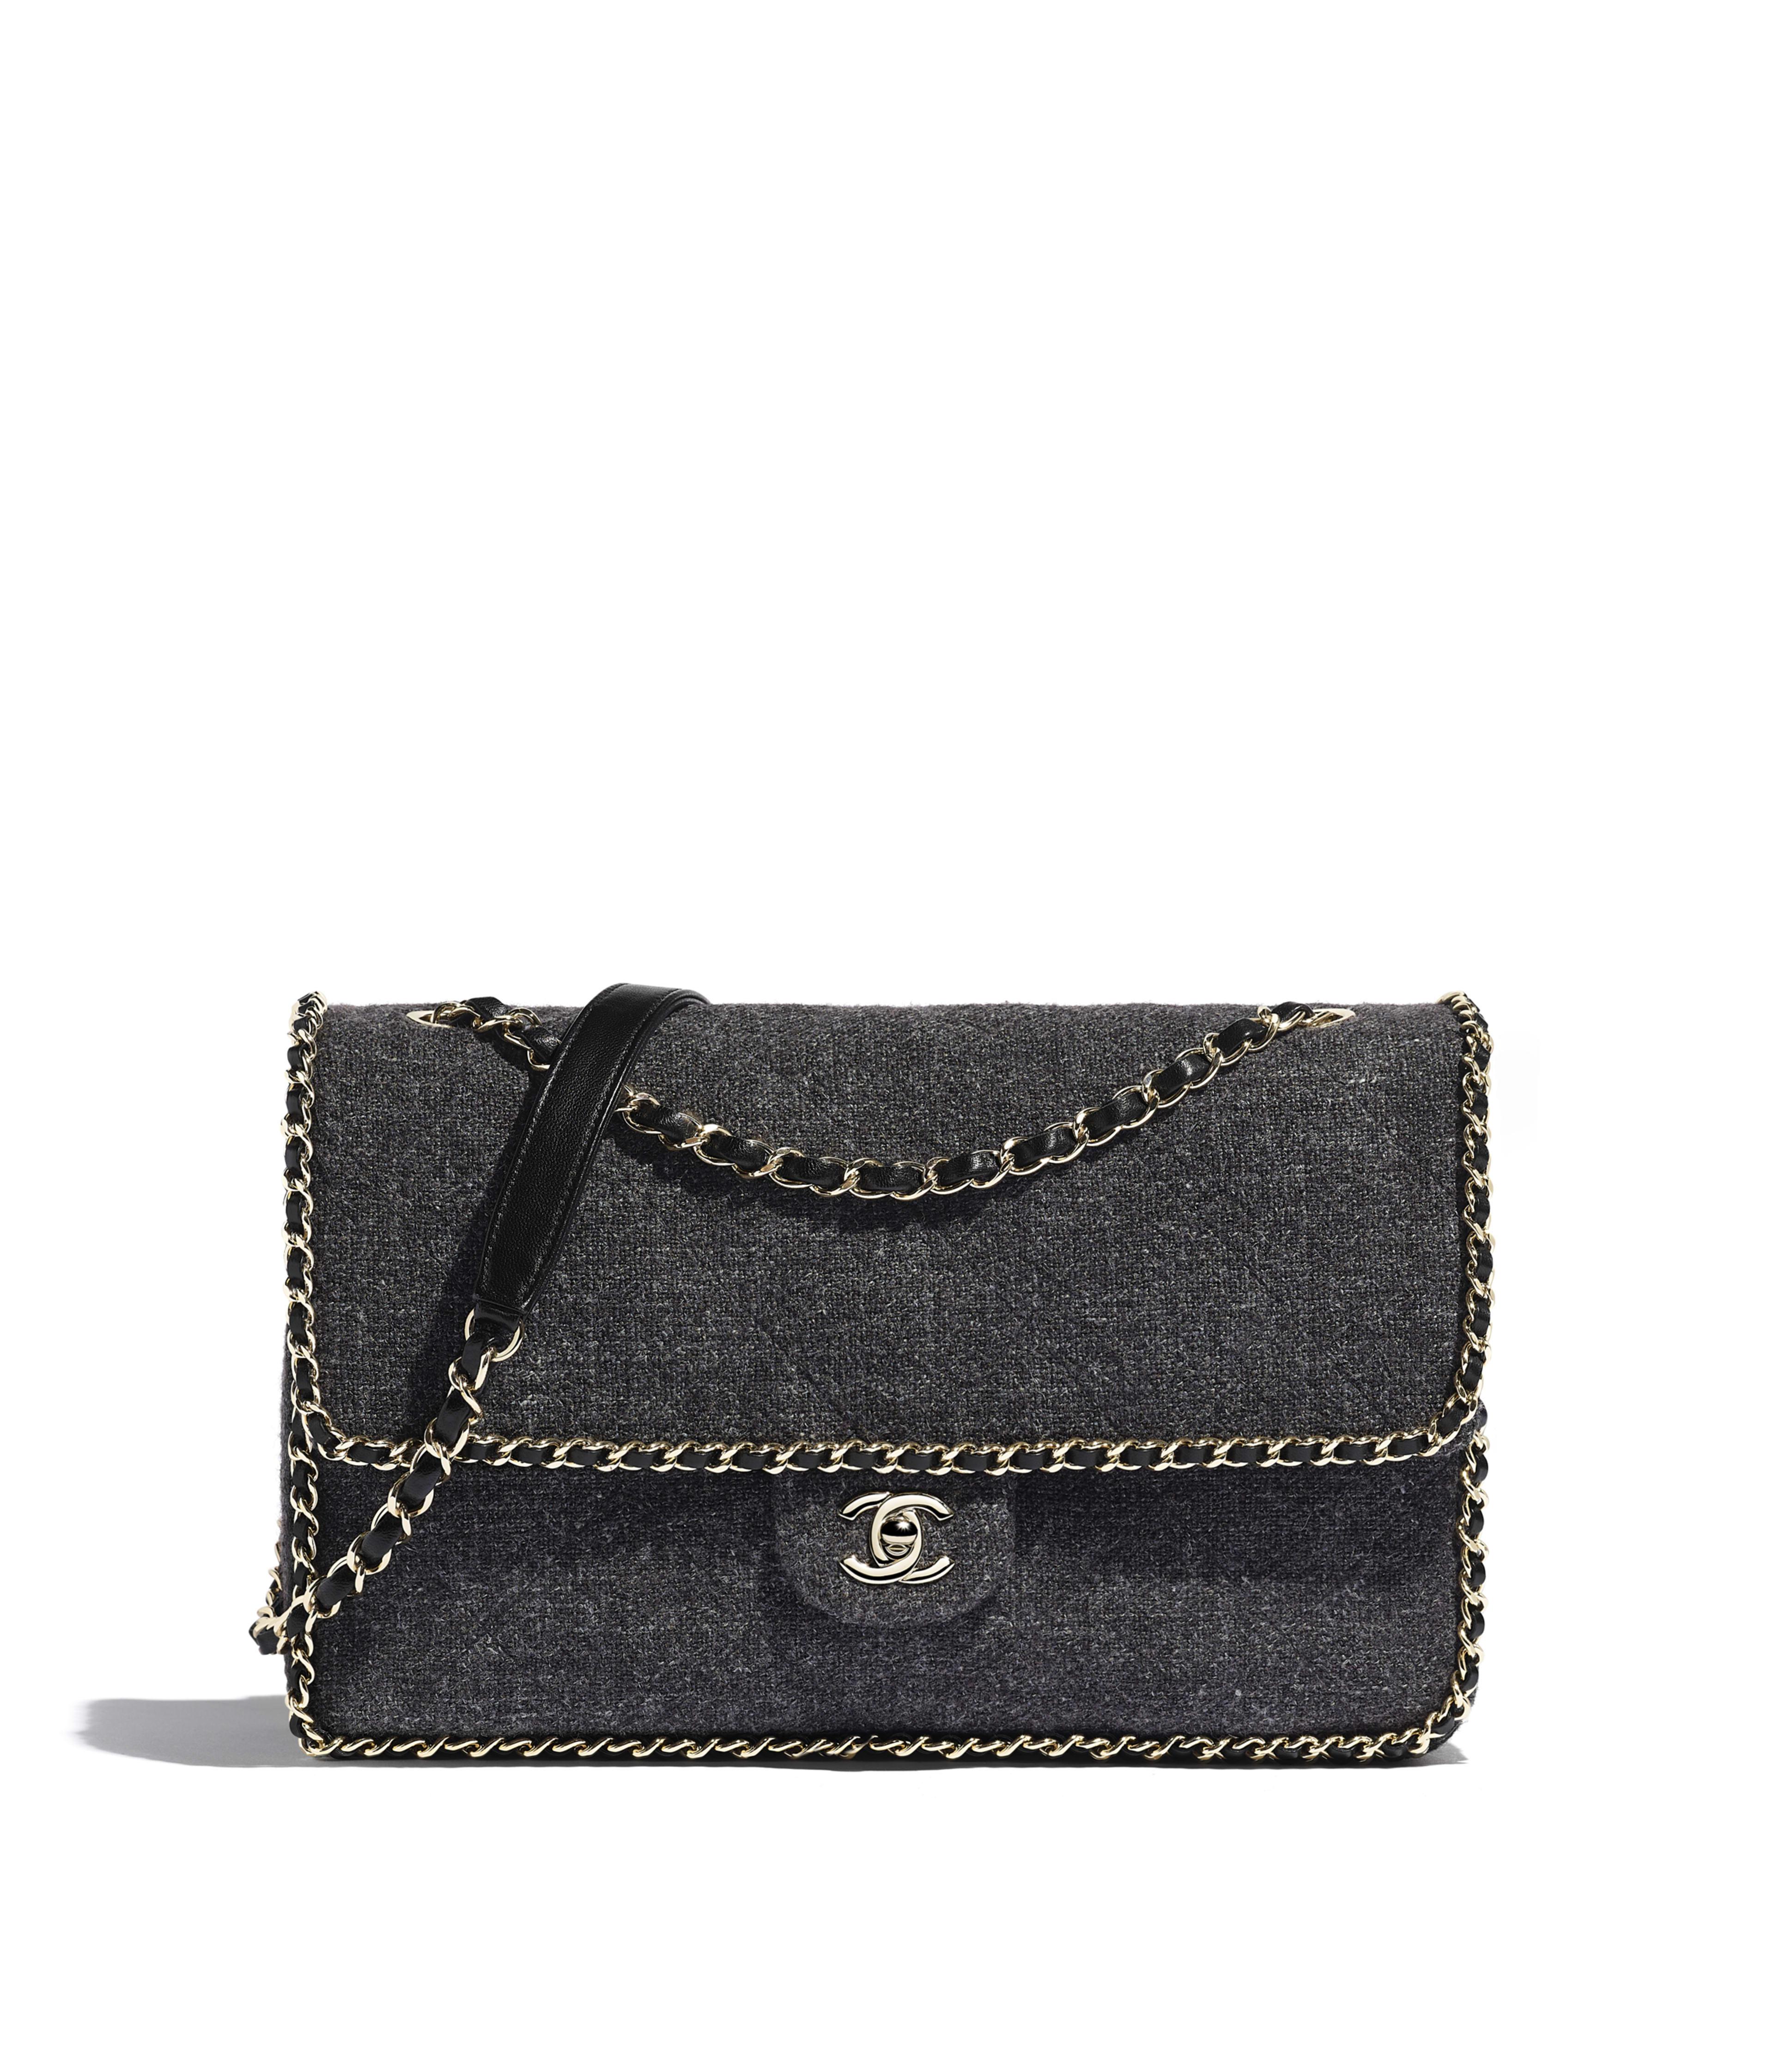 e53fdead14 Handbags - Fashion | CHANEL